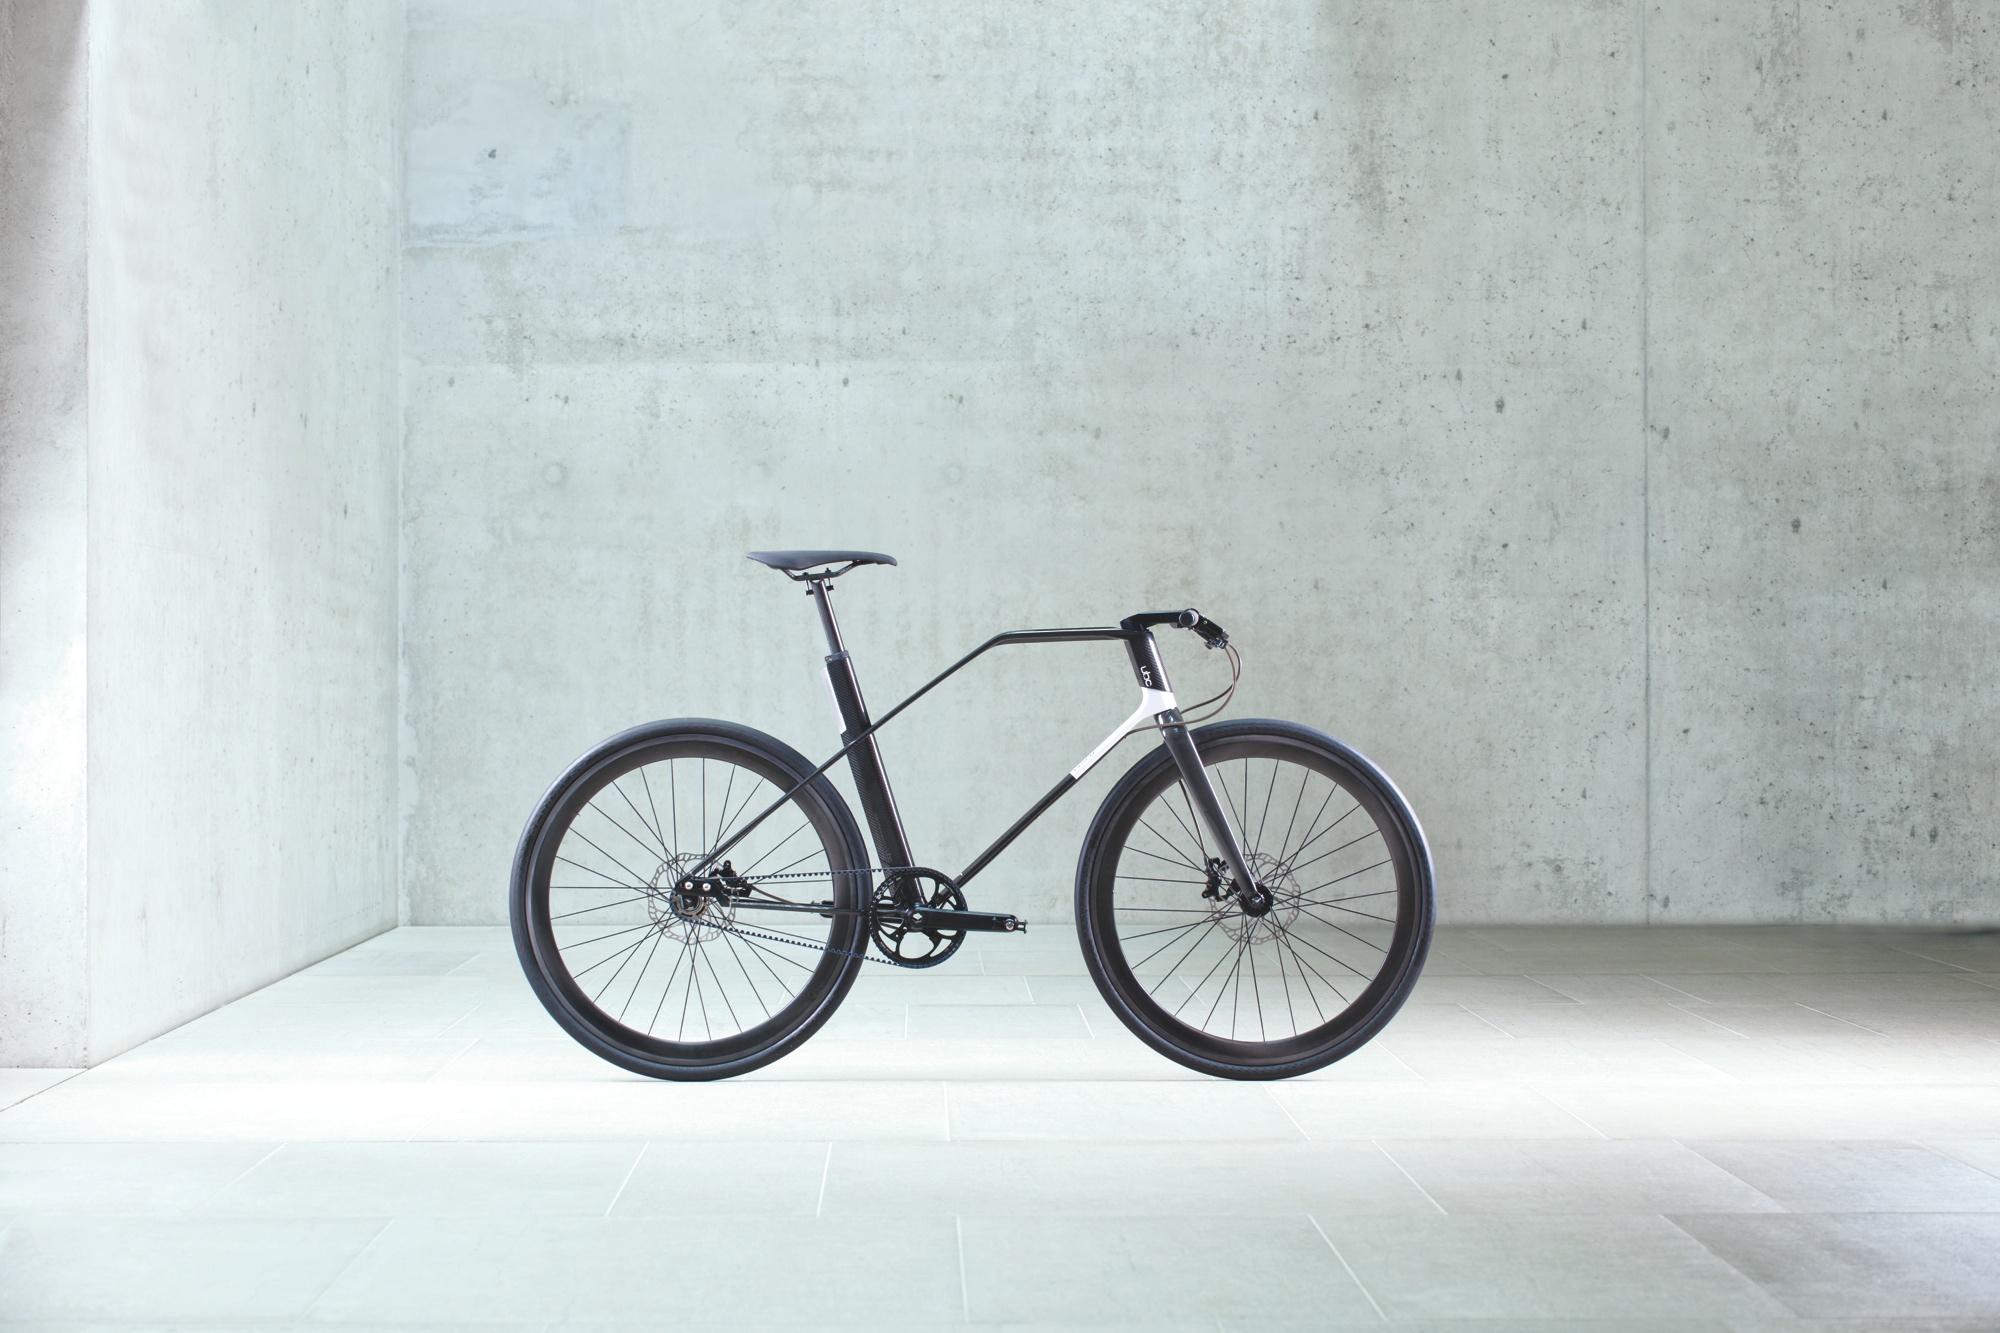 The Coren Carbon Fibre Bike